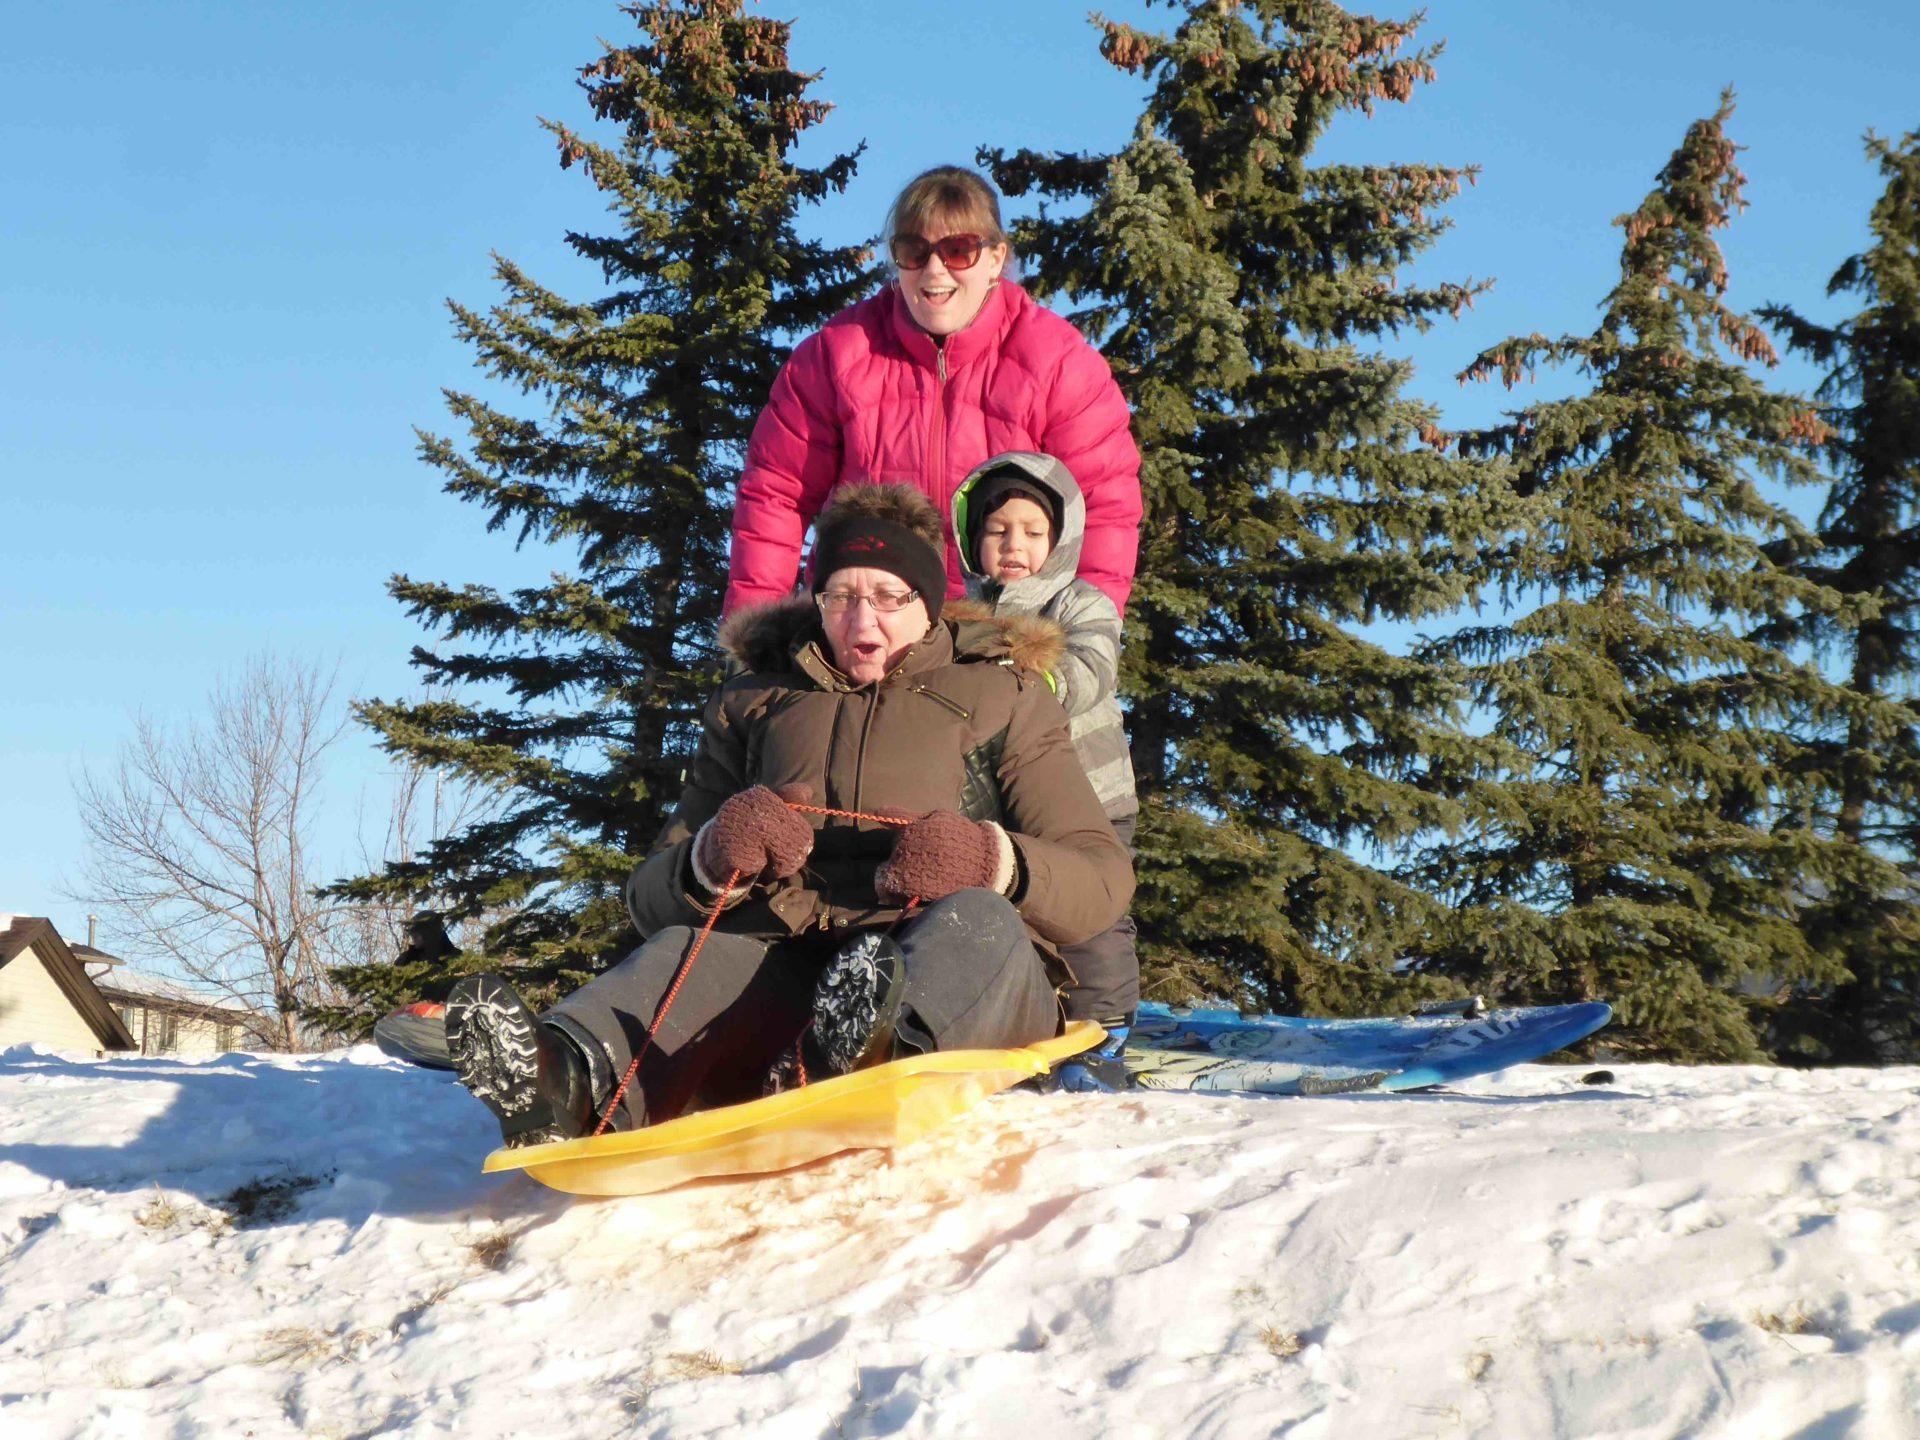 www.iamcalgary.ca I Am Calgary Toboggan and Sled Slopes